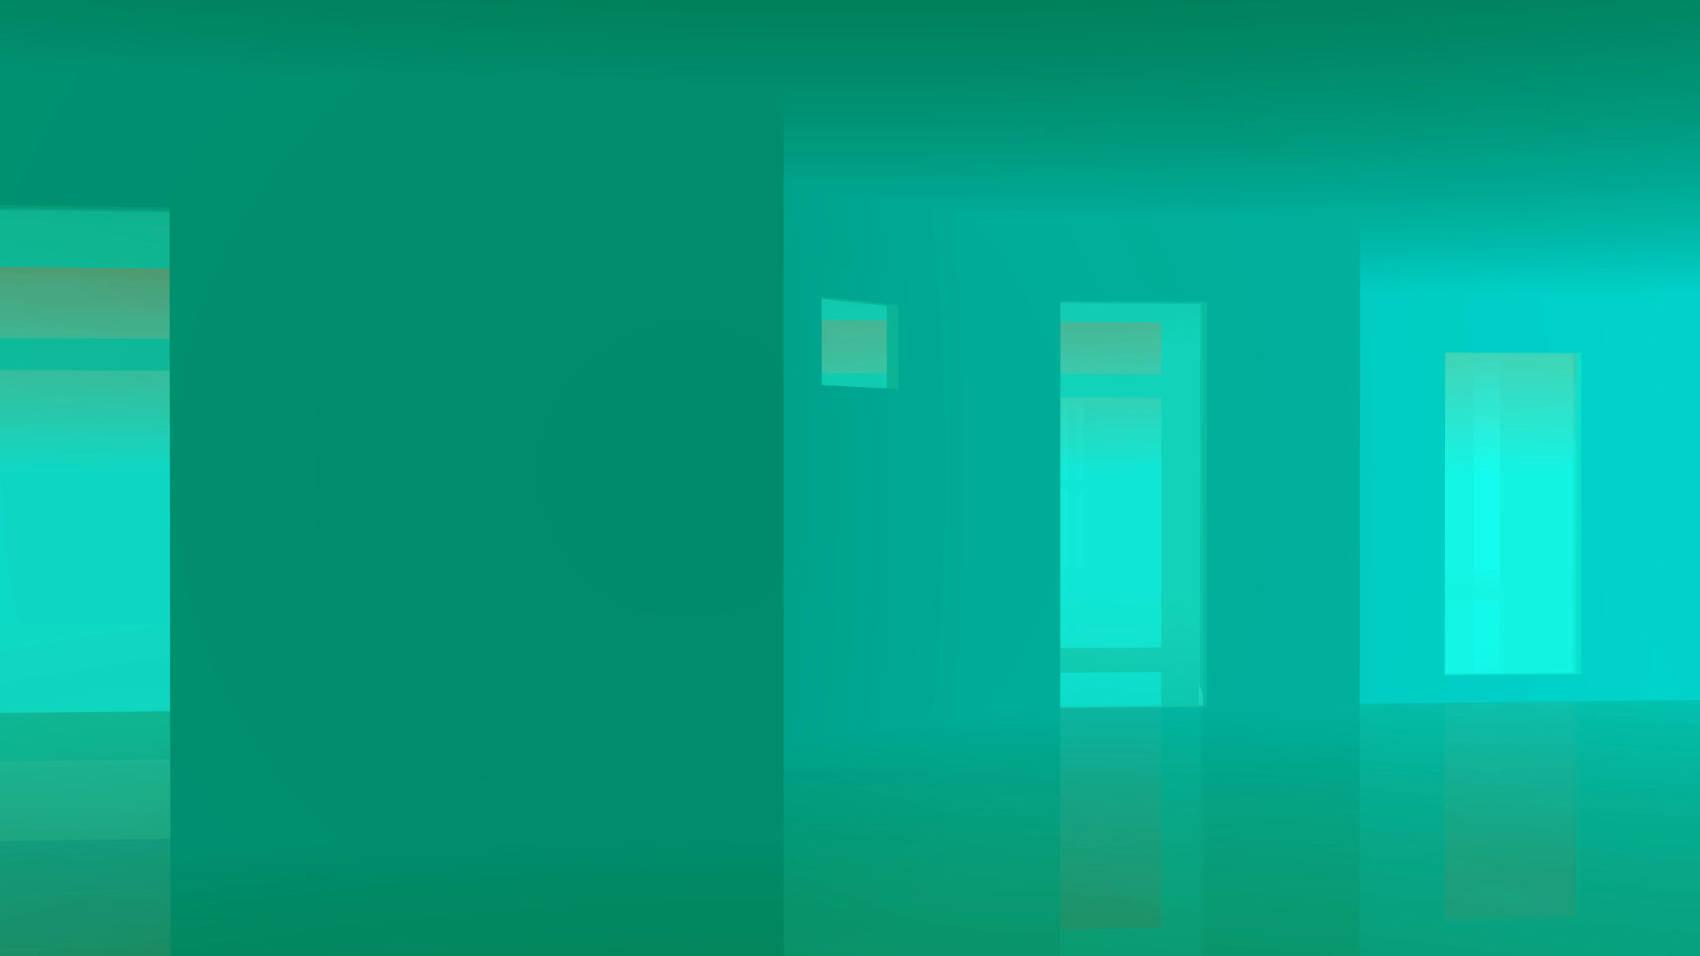 Light Sea Green Room, 2017, Jet d'encre, 77 x 137 cm